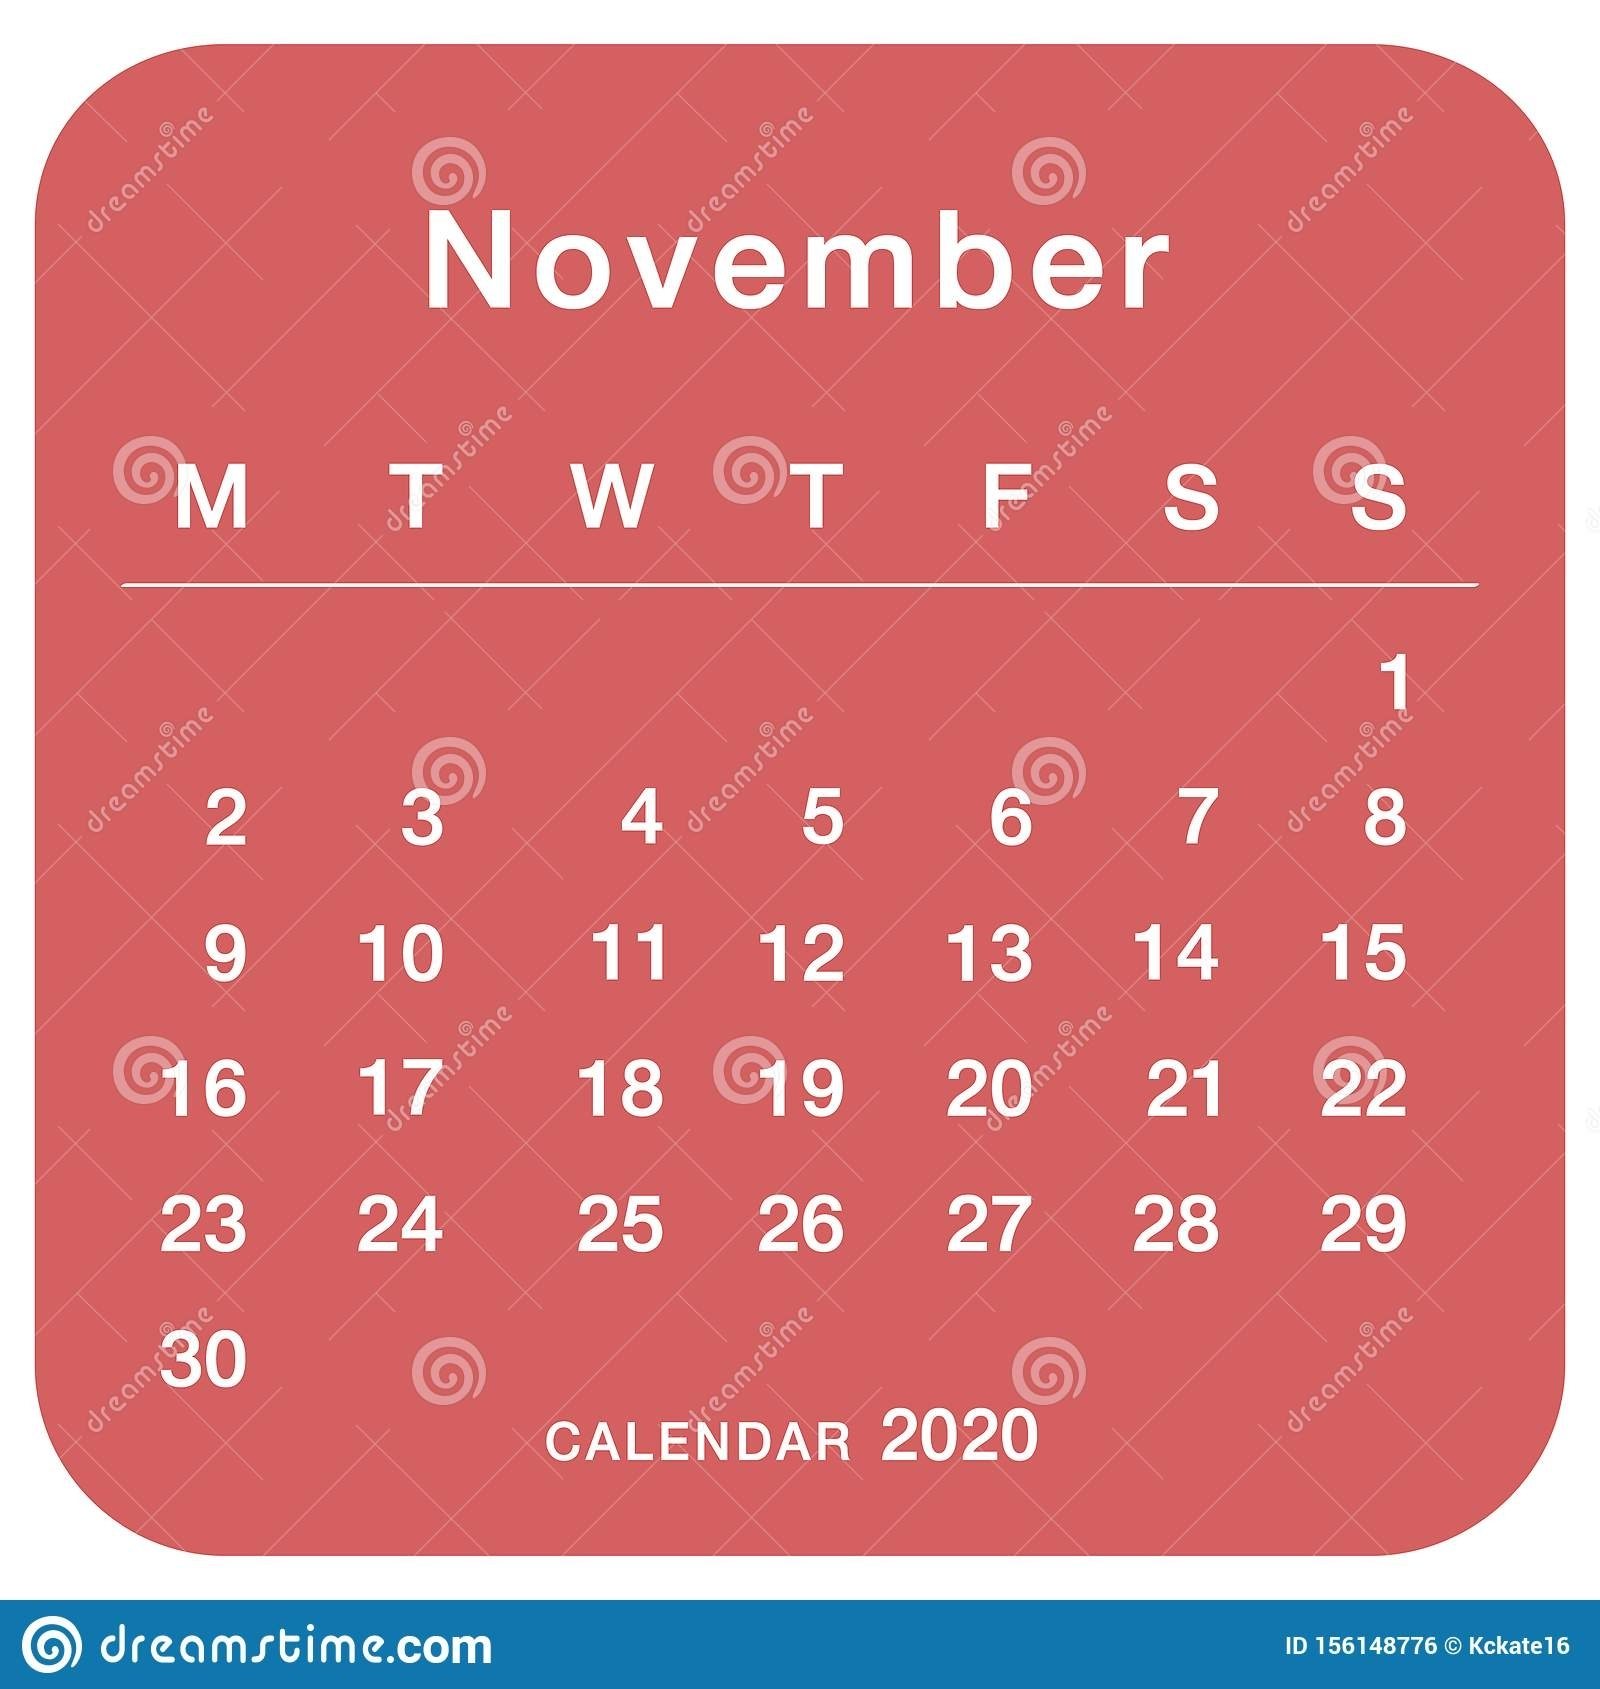 November 2020 Planning Calendar . Simple November 2020